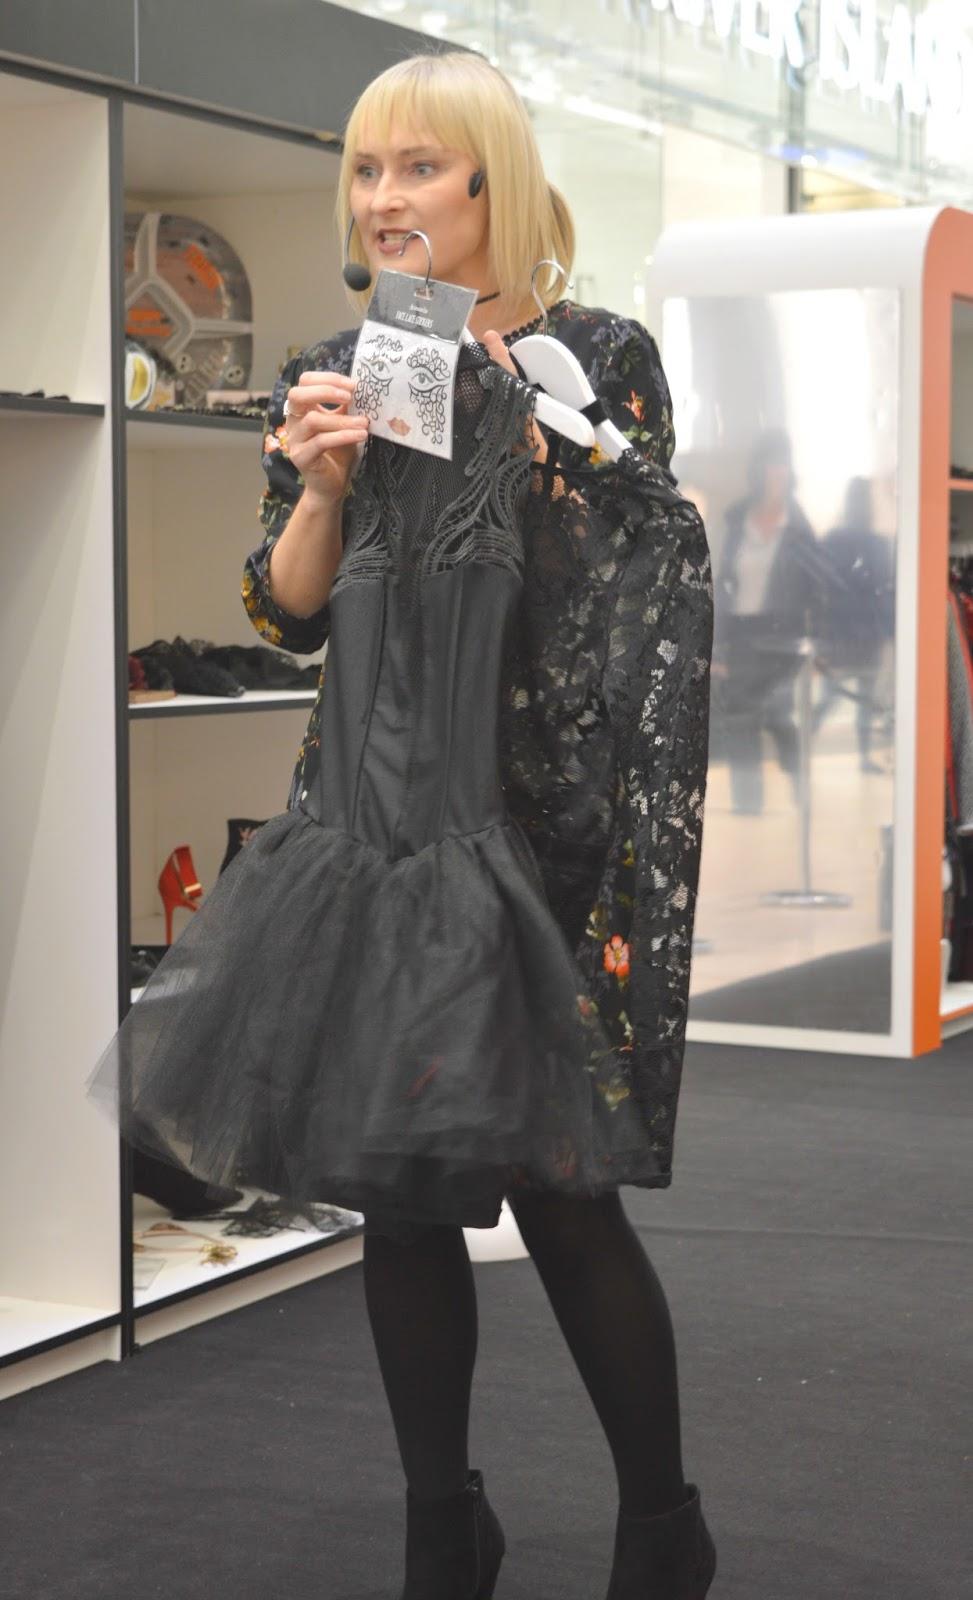 The Fashion Spooktacular Intu Eldon Square  - Halloween Style